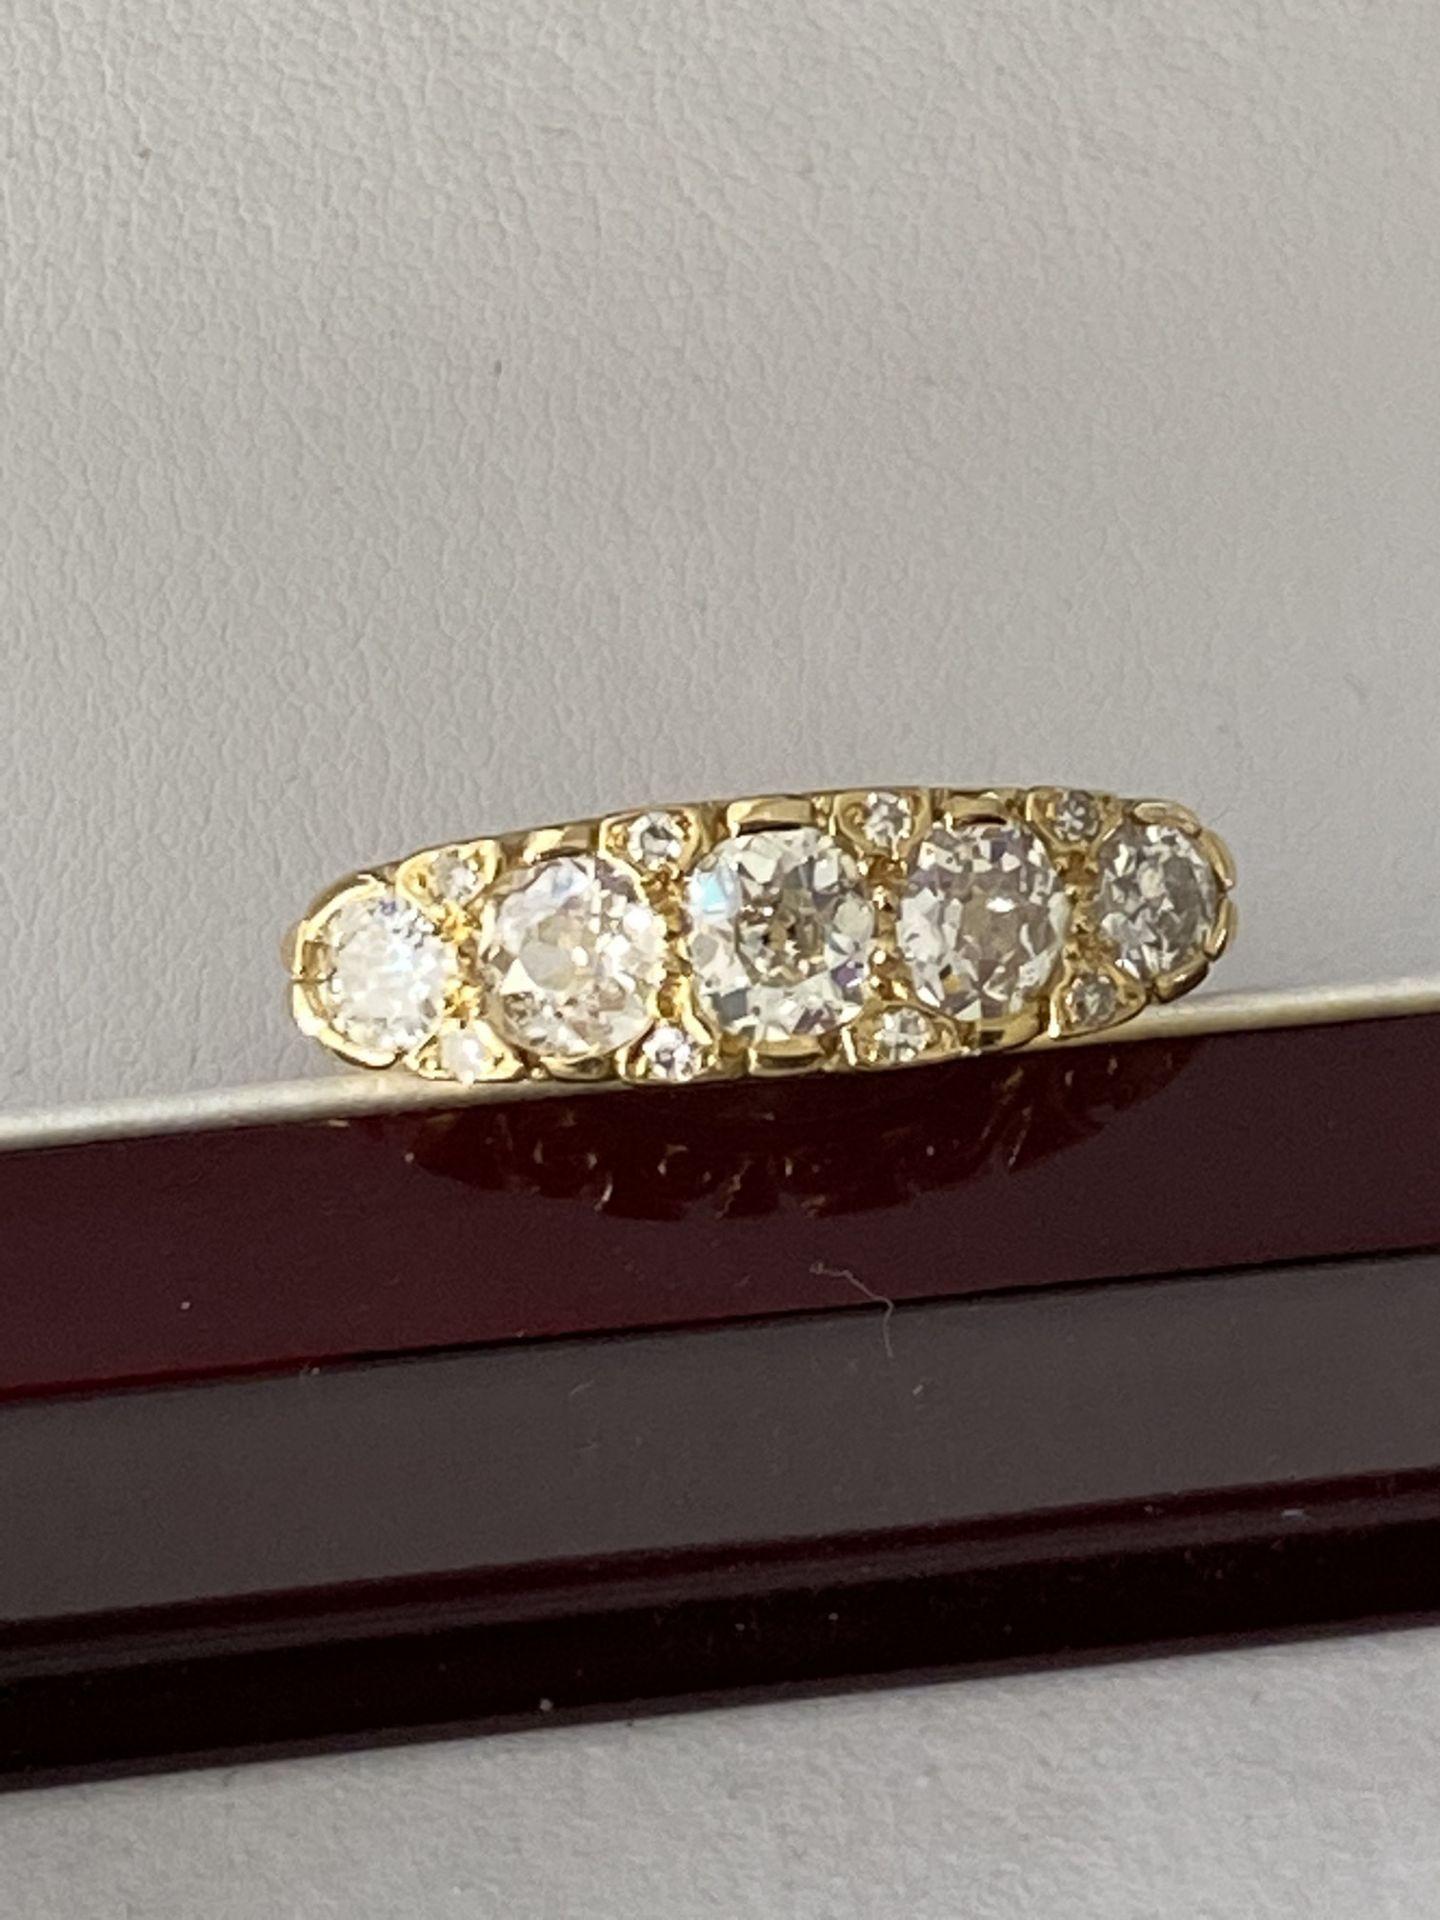 FINE 18ct YELLOW GOLD 2.00ct 5 STONE DIAMOND RING - Image 2 of 15